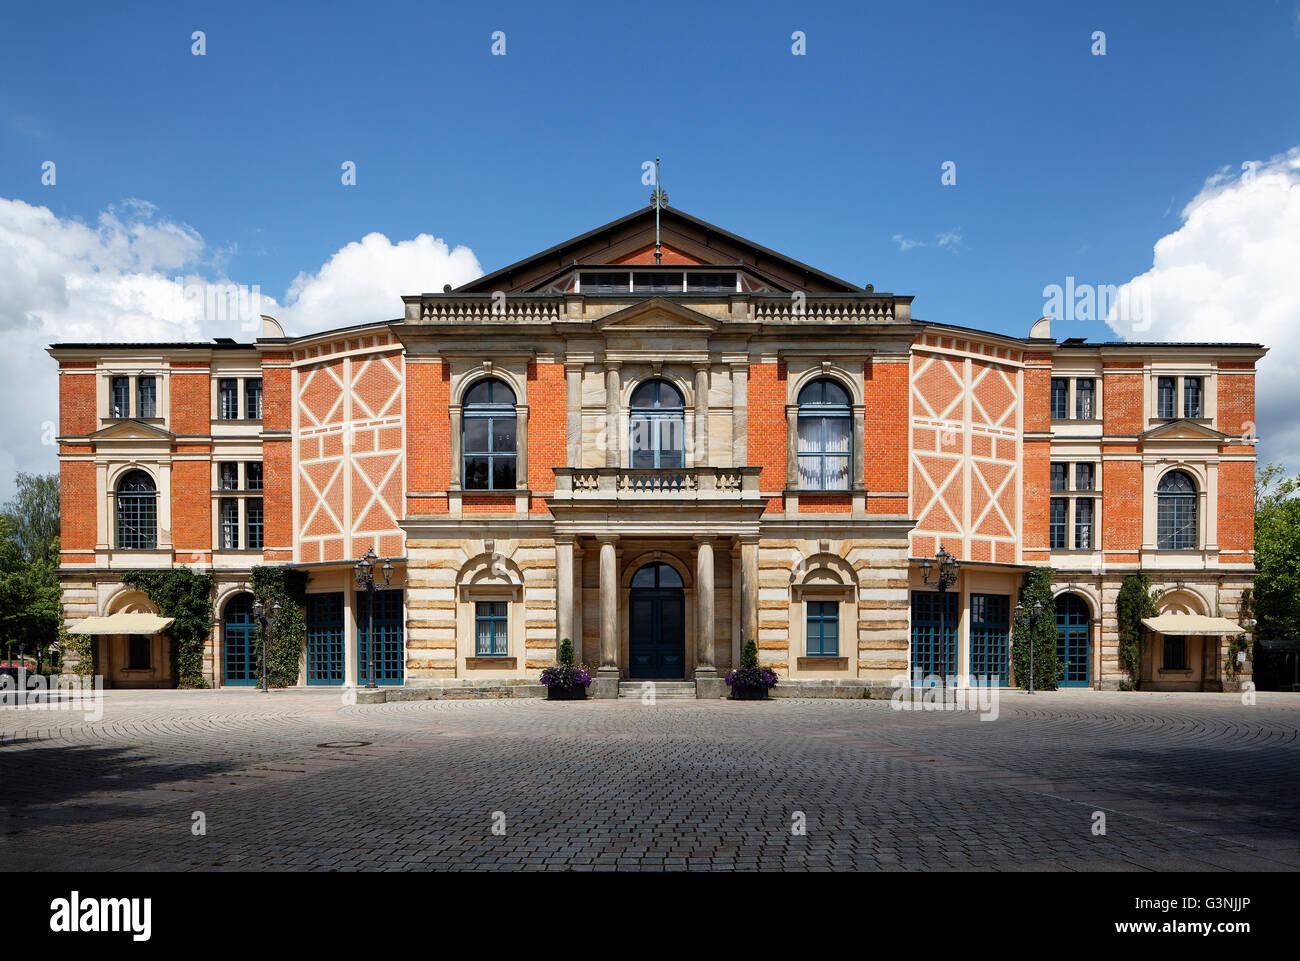 Bayreuther Festspielhaus, Richard-Wagner-Festspiele, Bayreuther Festspiele, Festival Hill, Bayreuth, Oberfranken, Stockbild